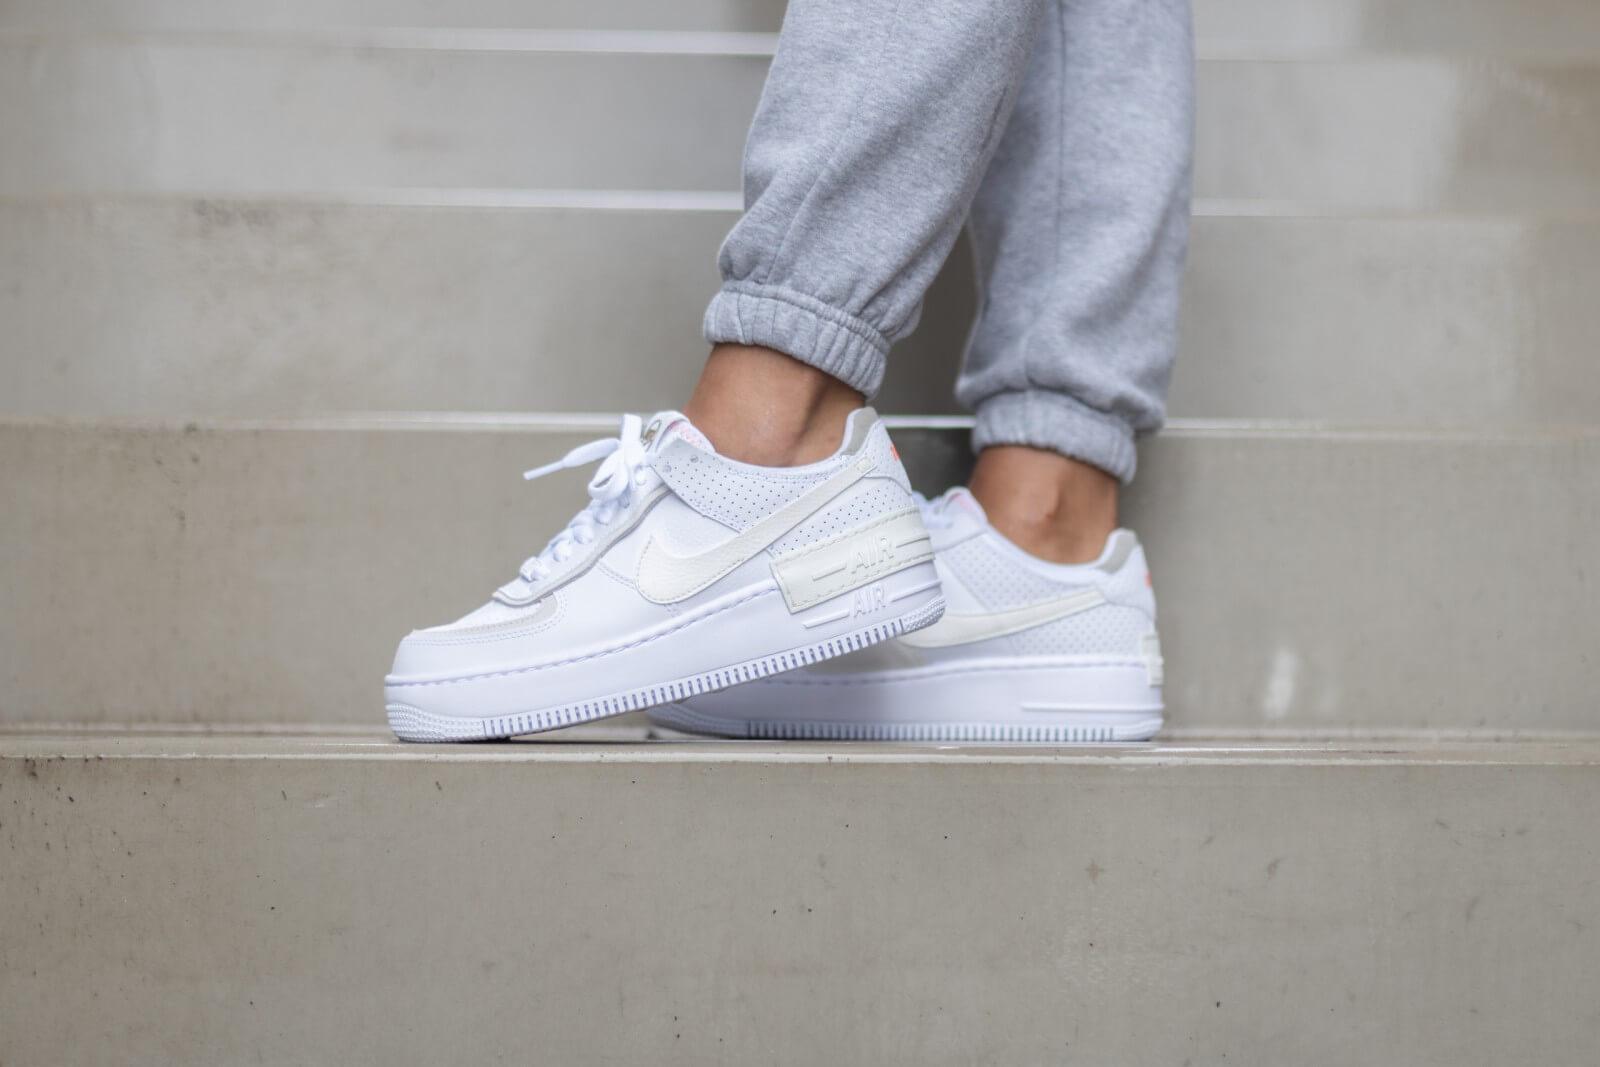 Nike Women's Air Force 1 Shadow WhiteSail Stone CZ8107 100